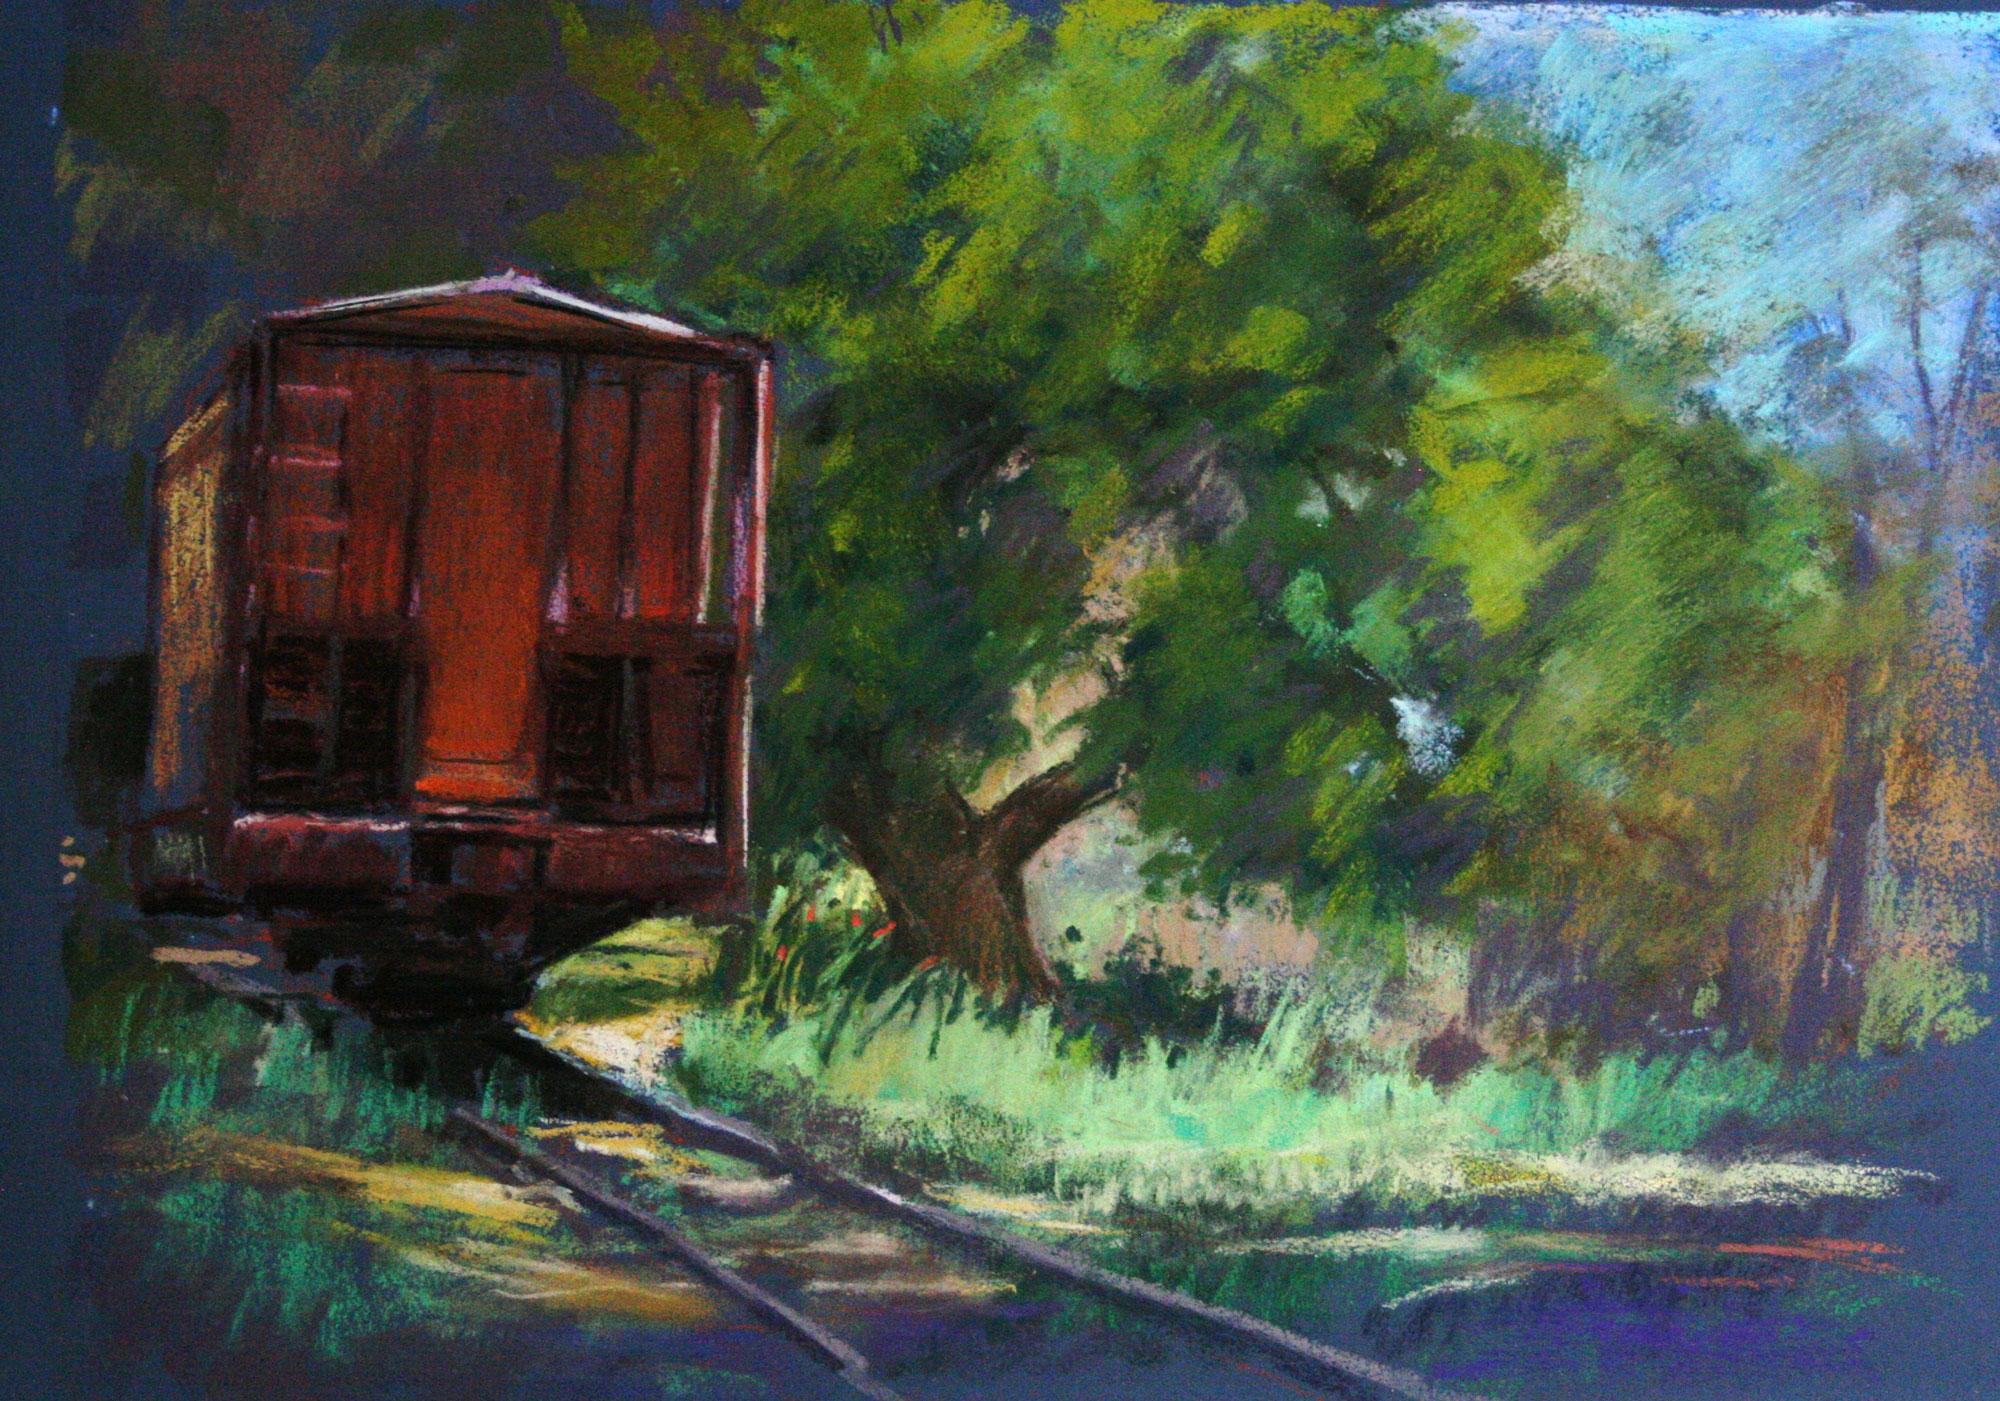 At Lamy, Old Train Car